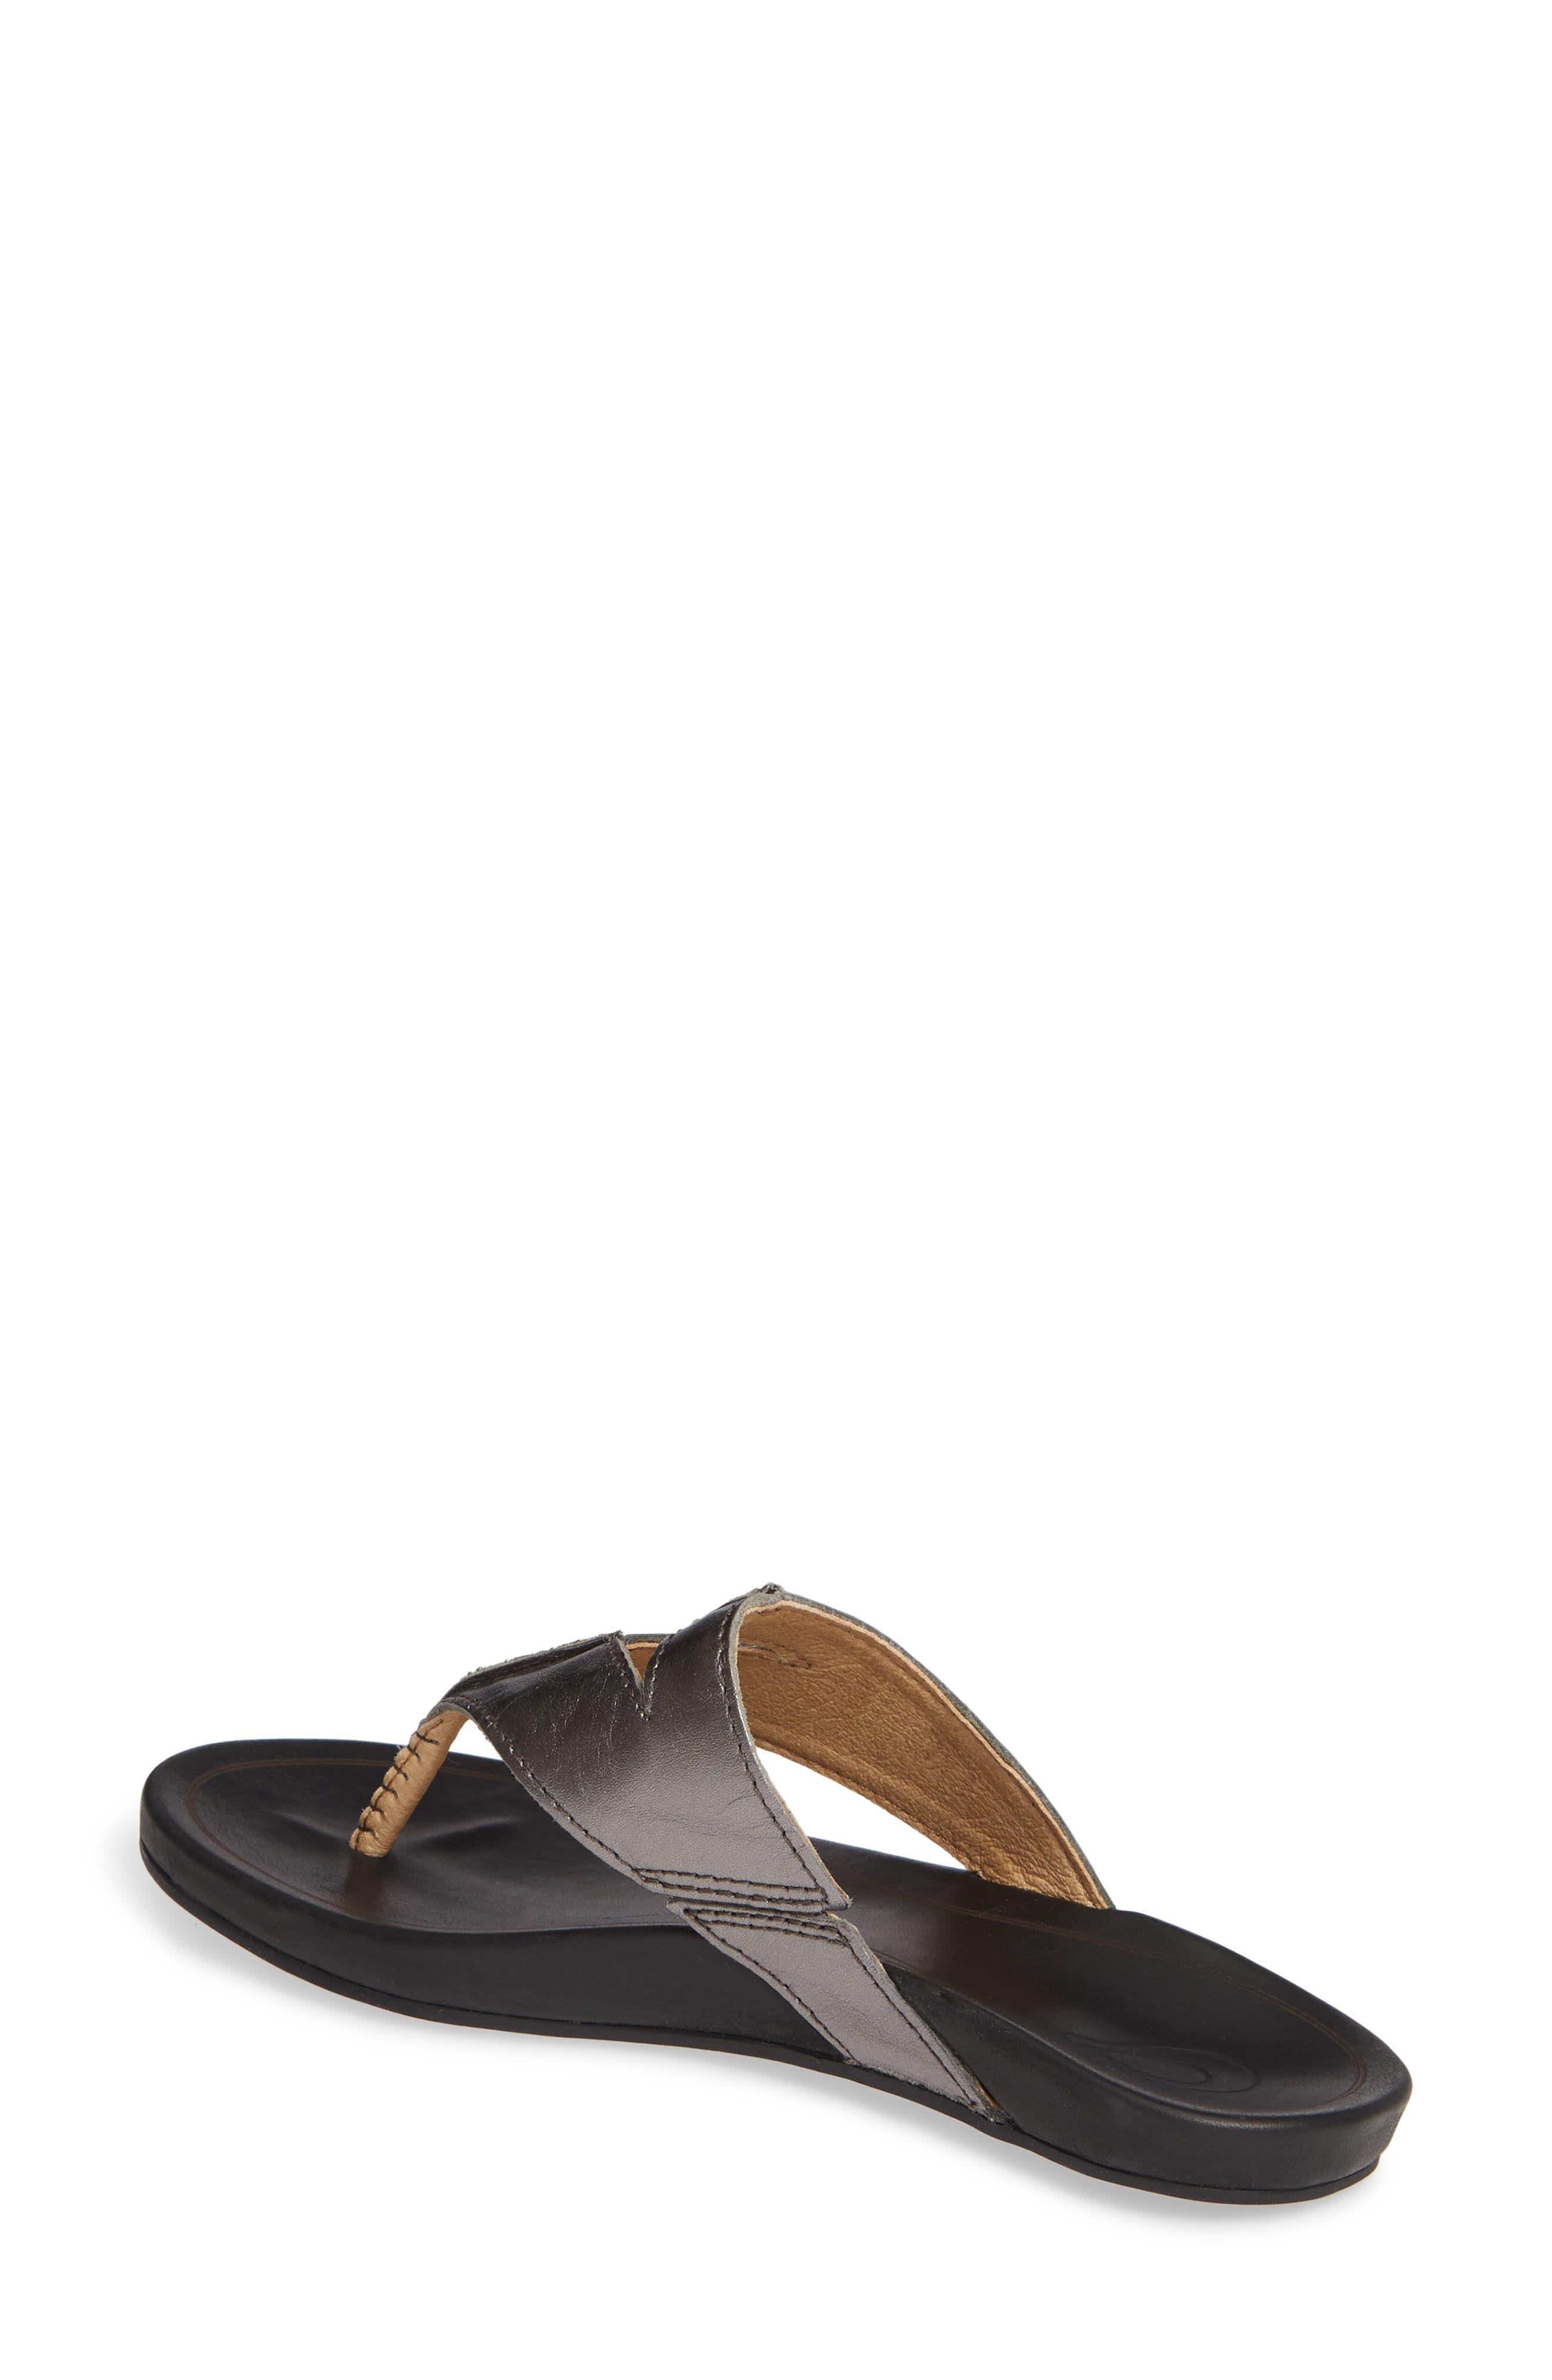 510450209 Shoe Steals  Women s Sandals